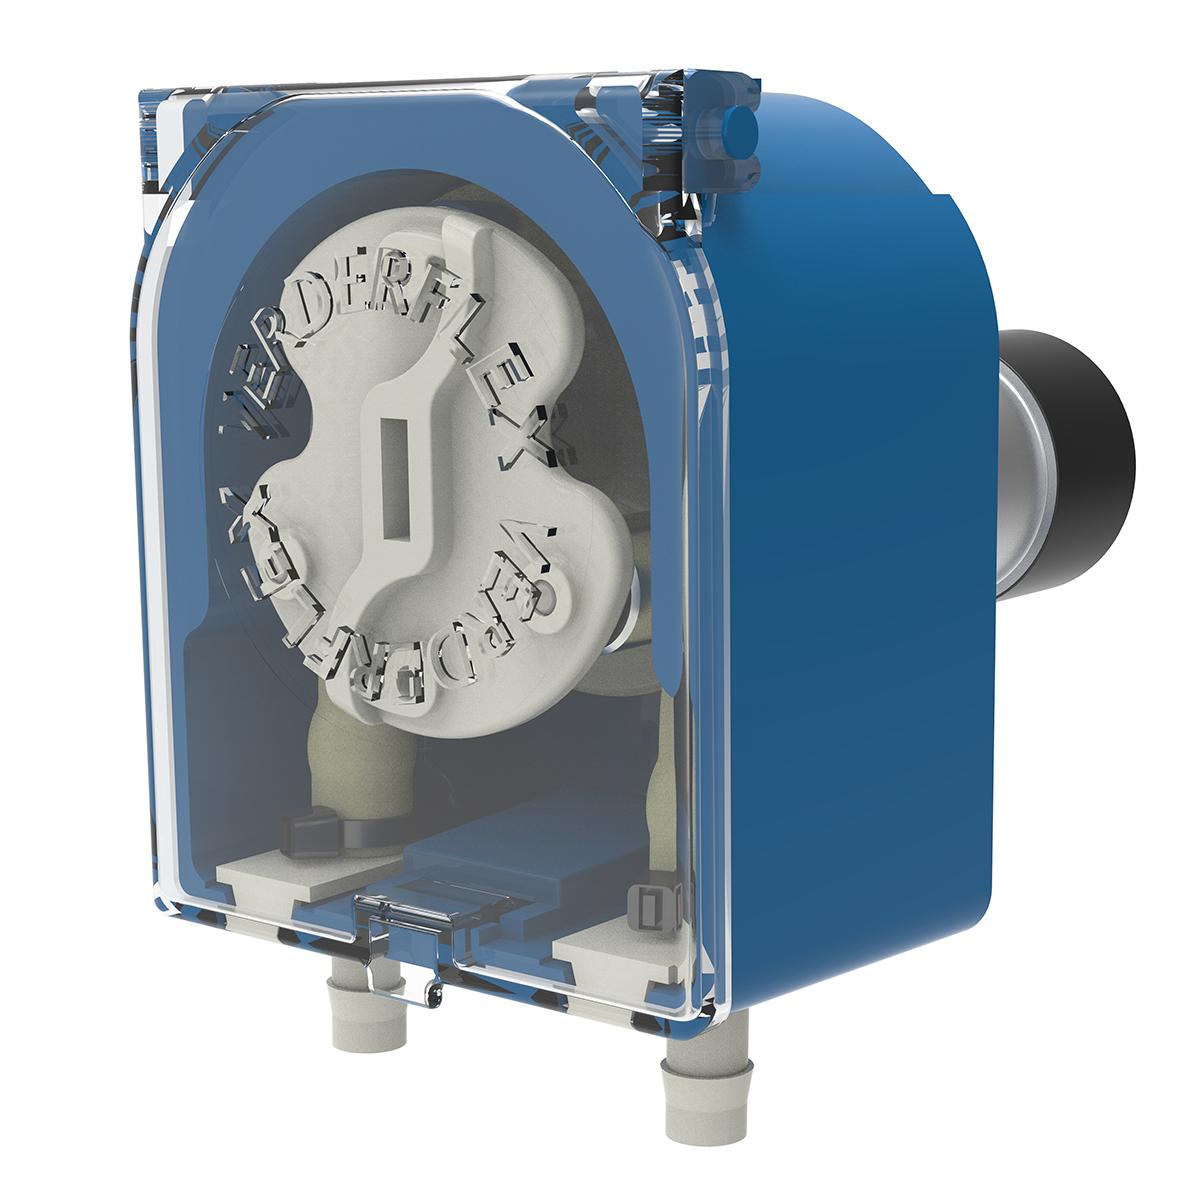 OEM-Schlauchpumpe M025, 12V DC, 15 ml/min